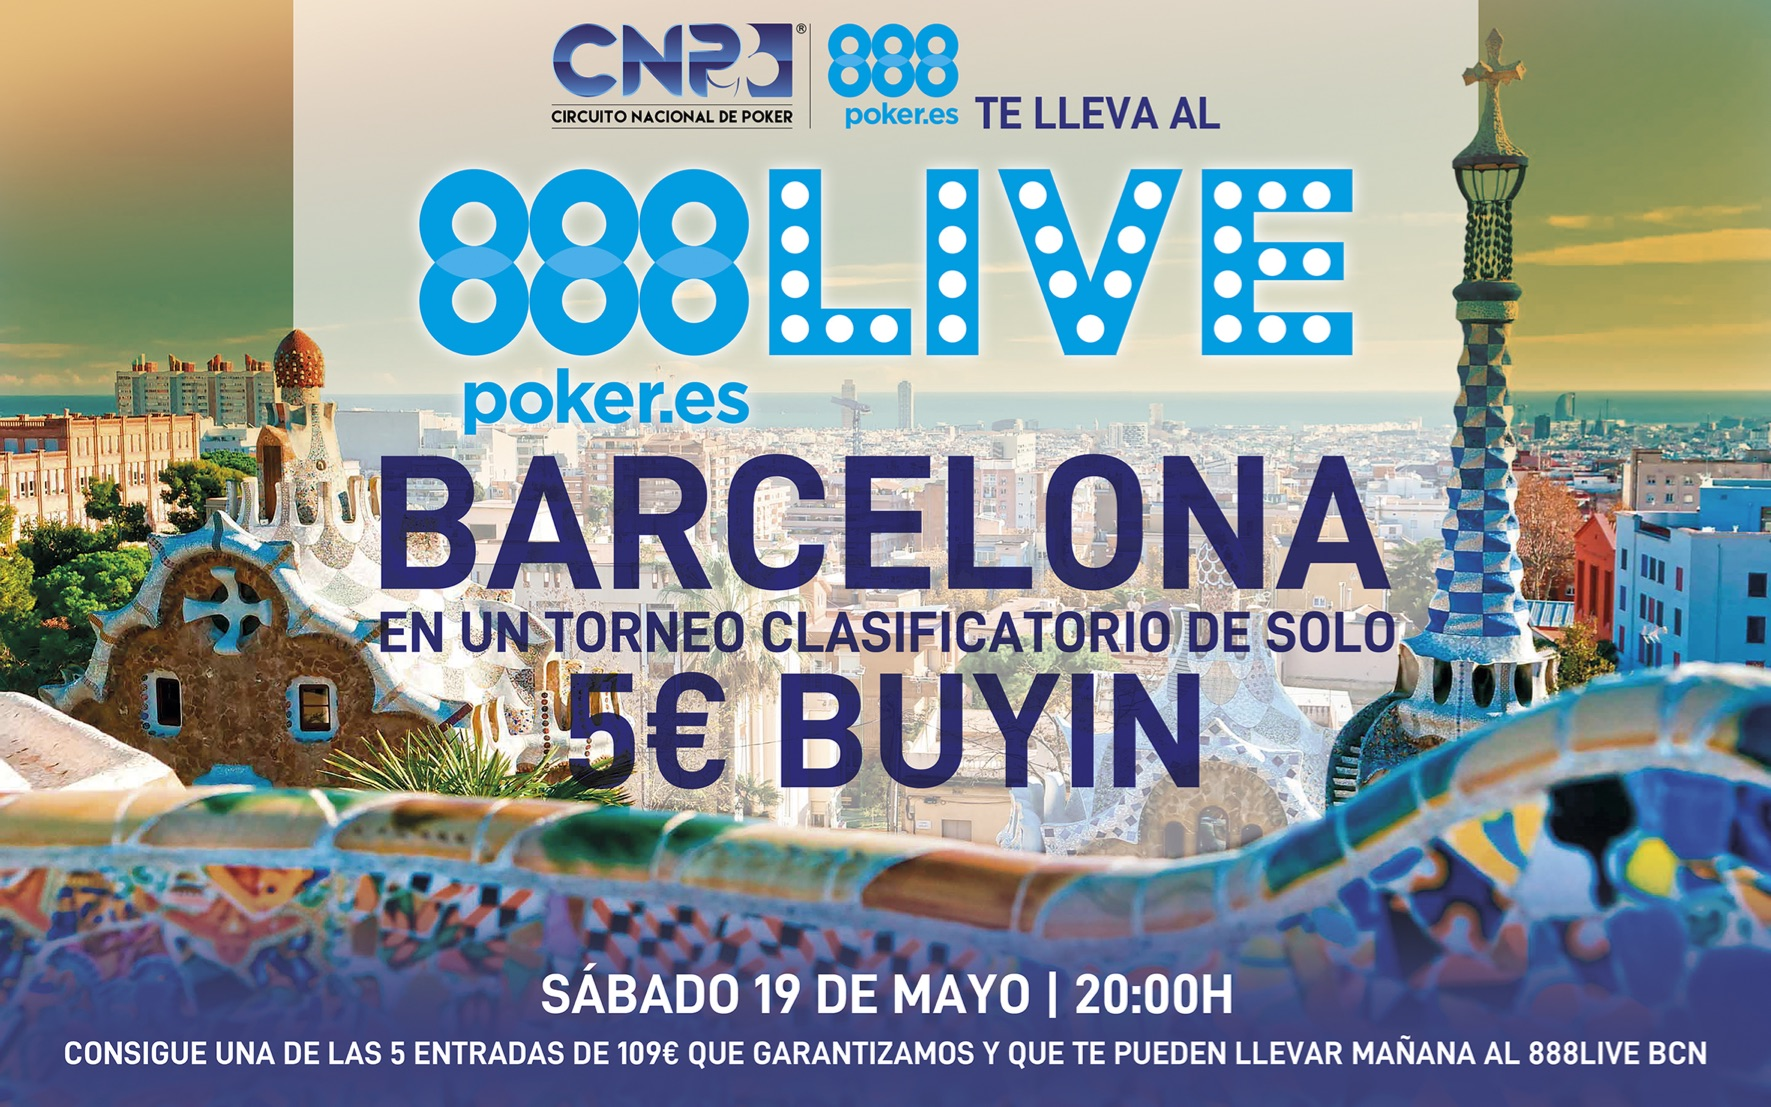 Tabla poker general los mejores casino online Lanús-579147